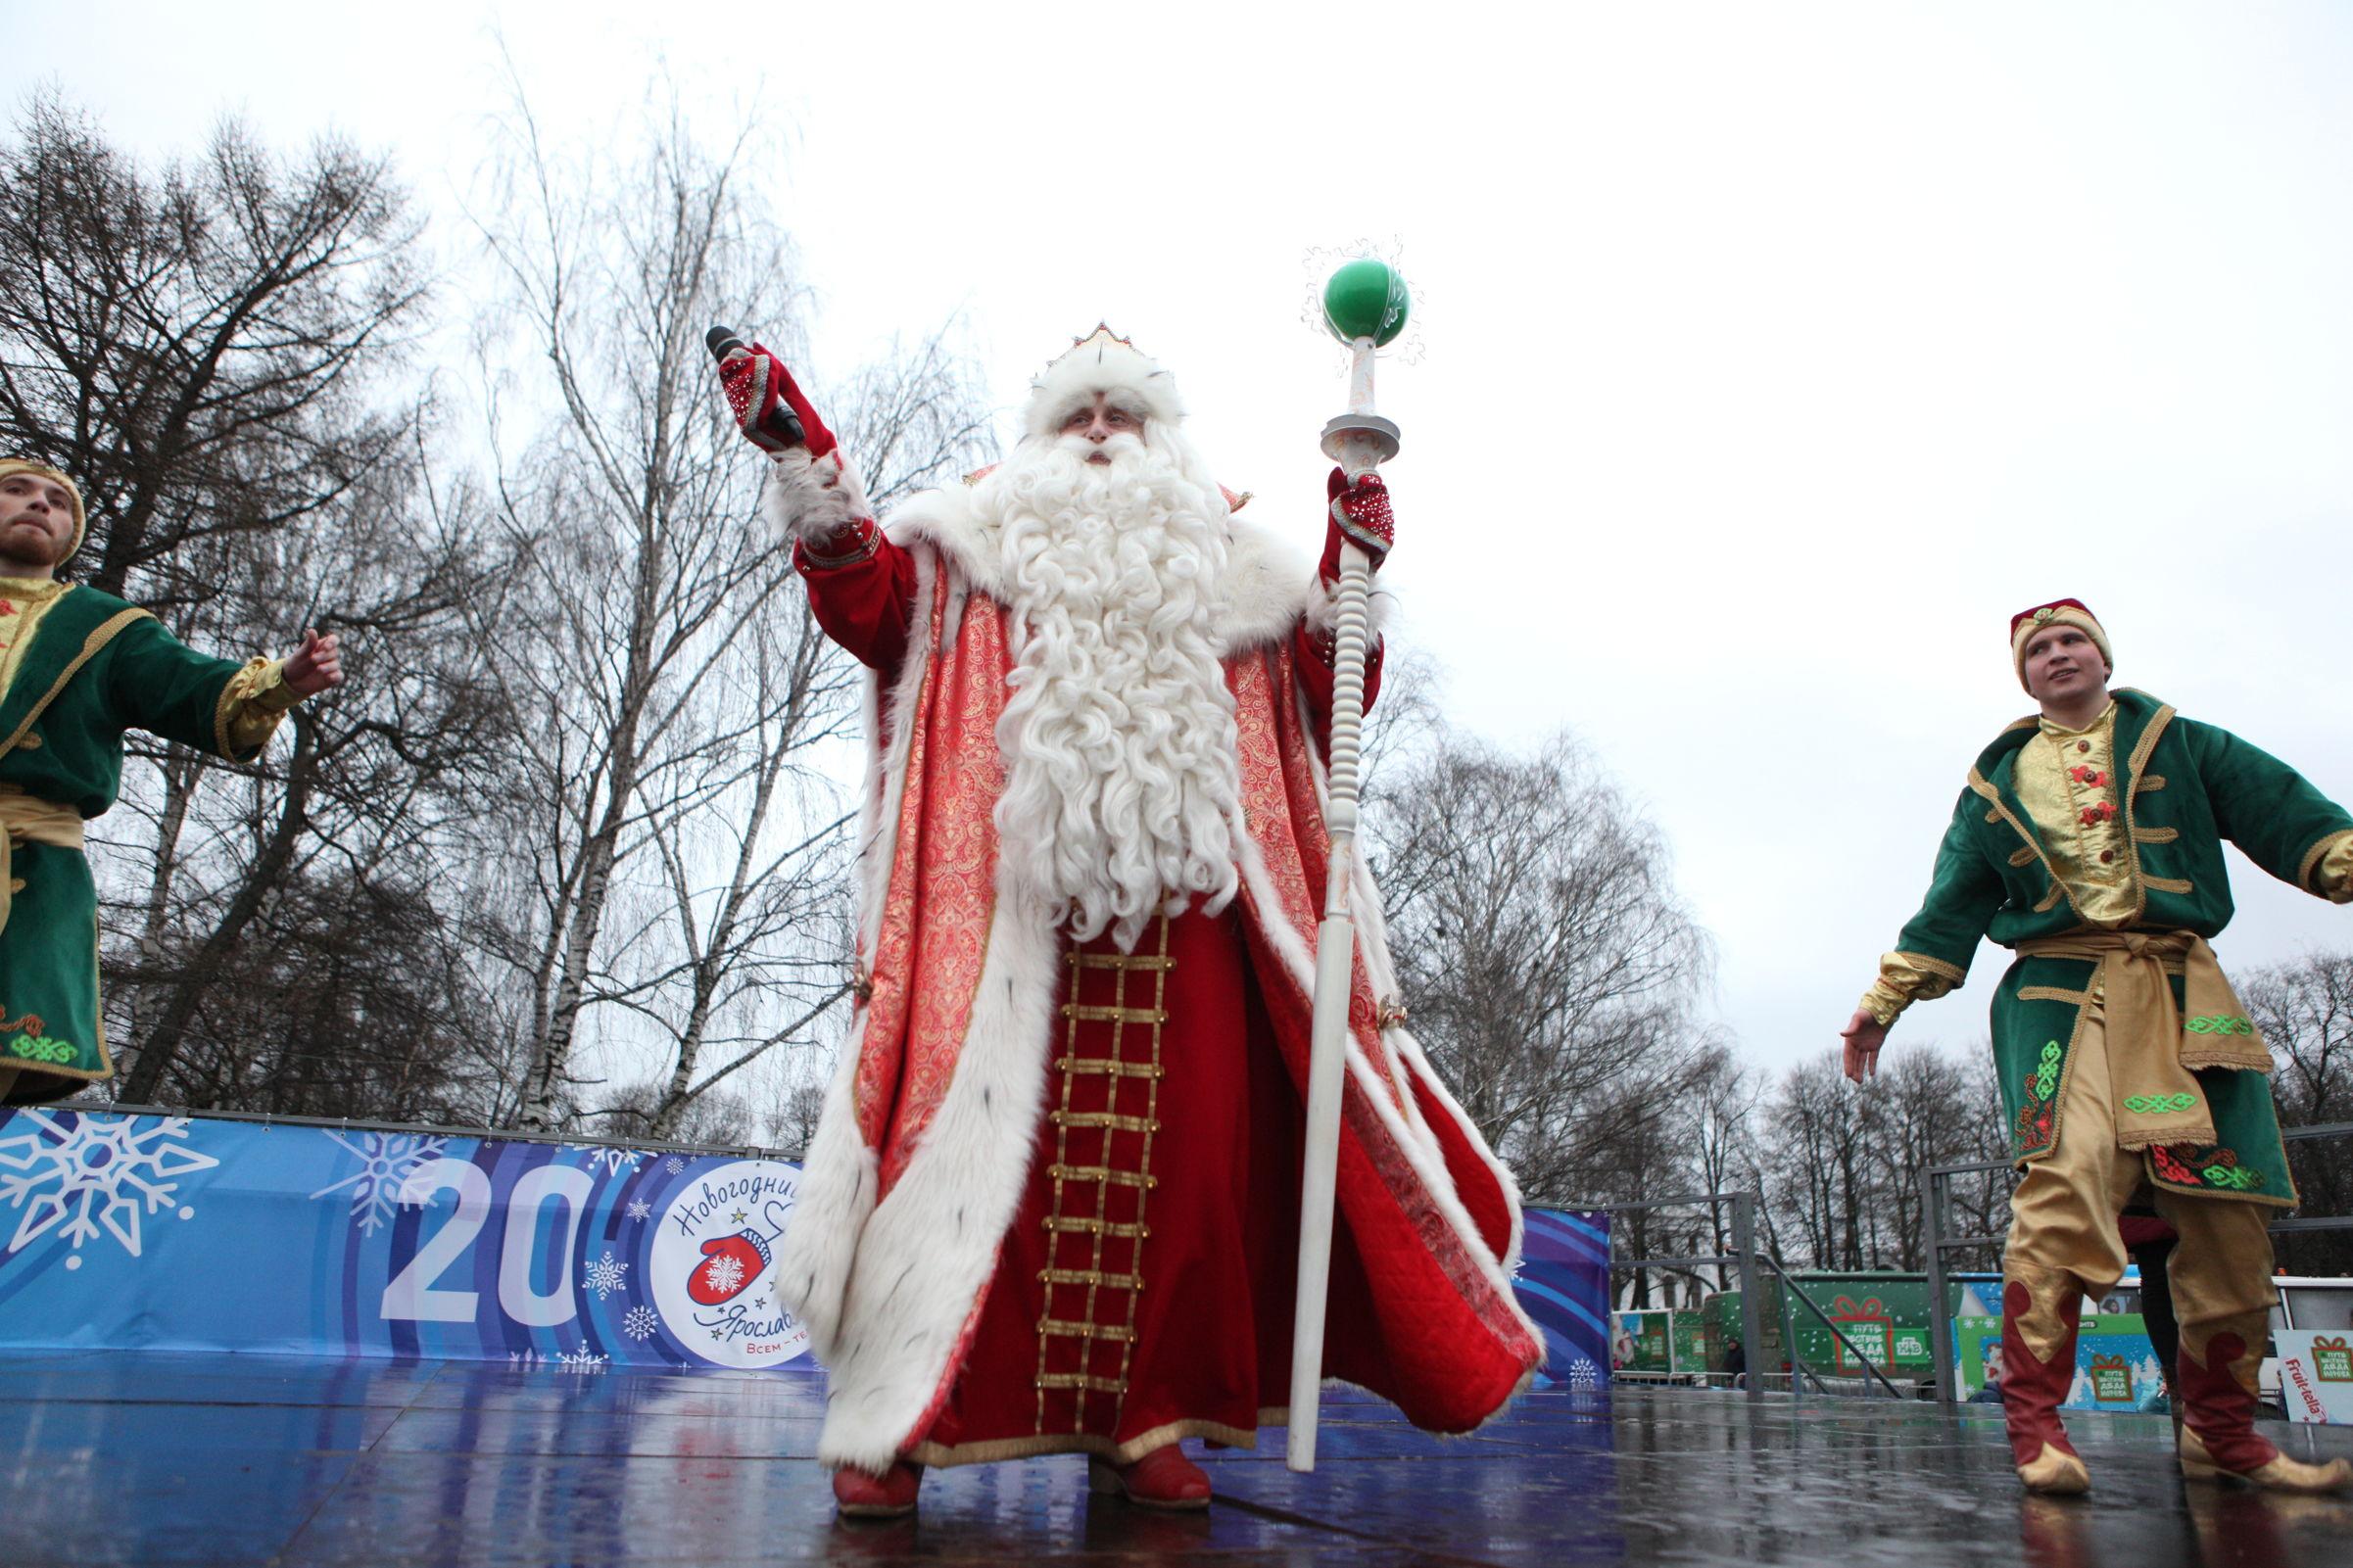 Ярославское путешествие Деда Мороза